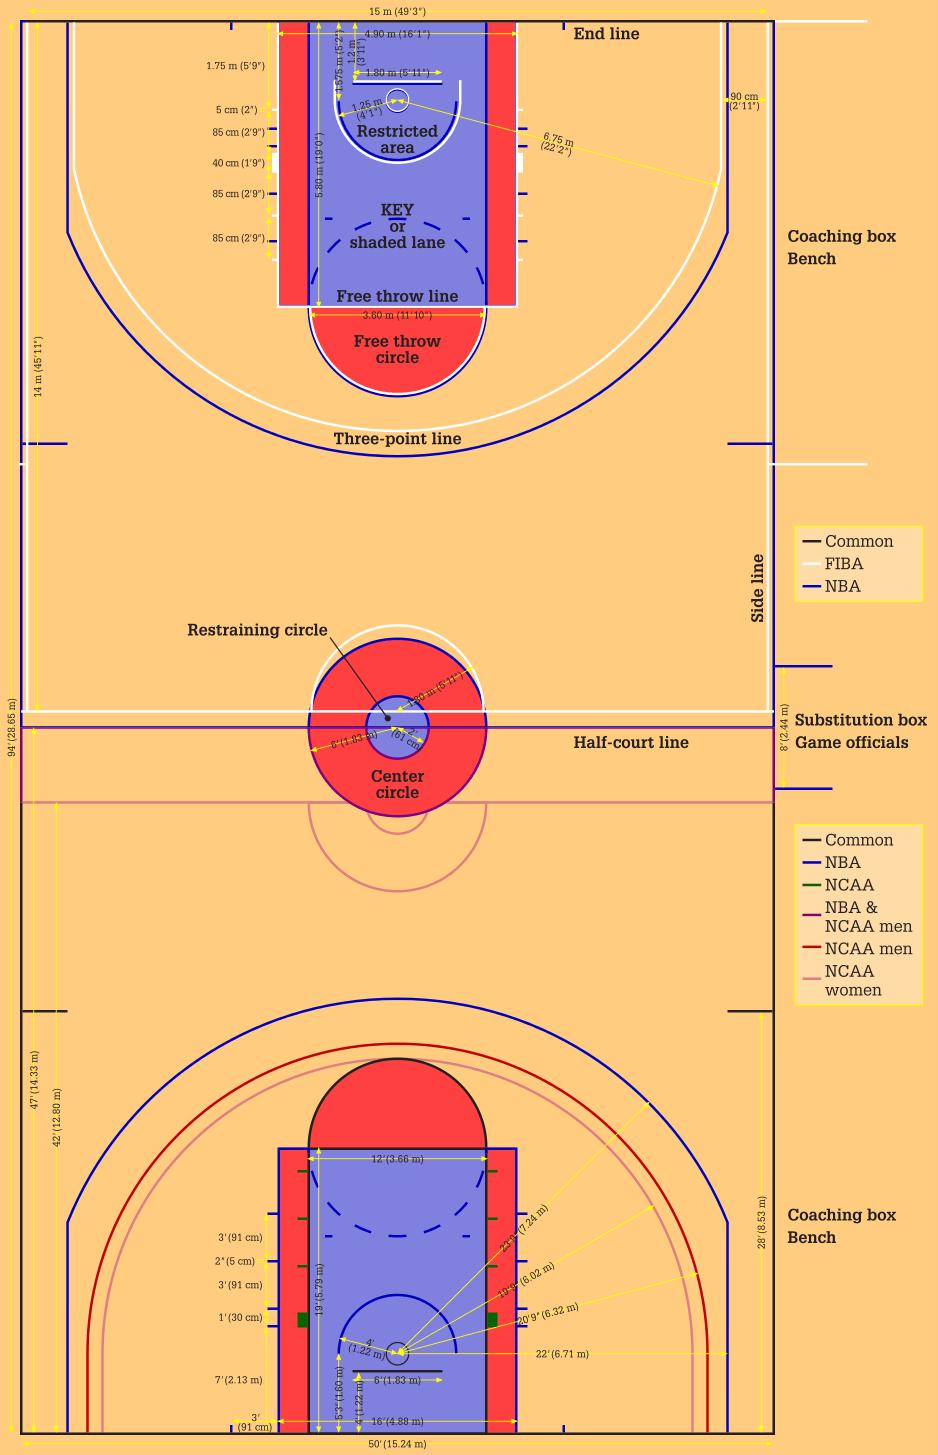 Panjang Dan Lebar Lapangan Bola : panjang, lebar, lapangan, Pecinta, Basket,, Inilah, Kriteria, Ukuran, Lapangan, Basket, Standar, Internasional, Kompasiana.com